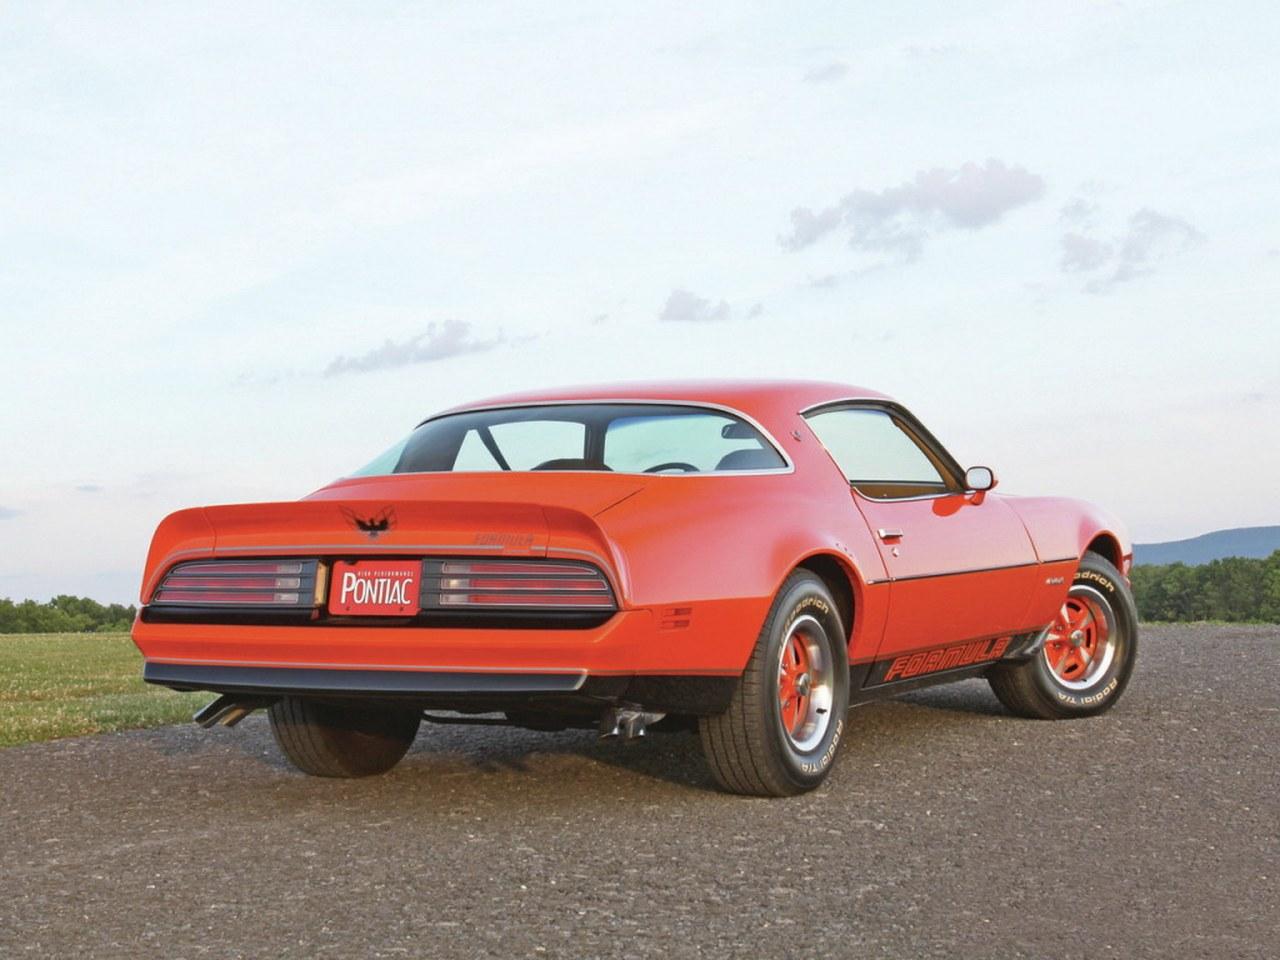 Pontiac_Firebird_70-81_01.jpg